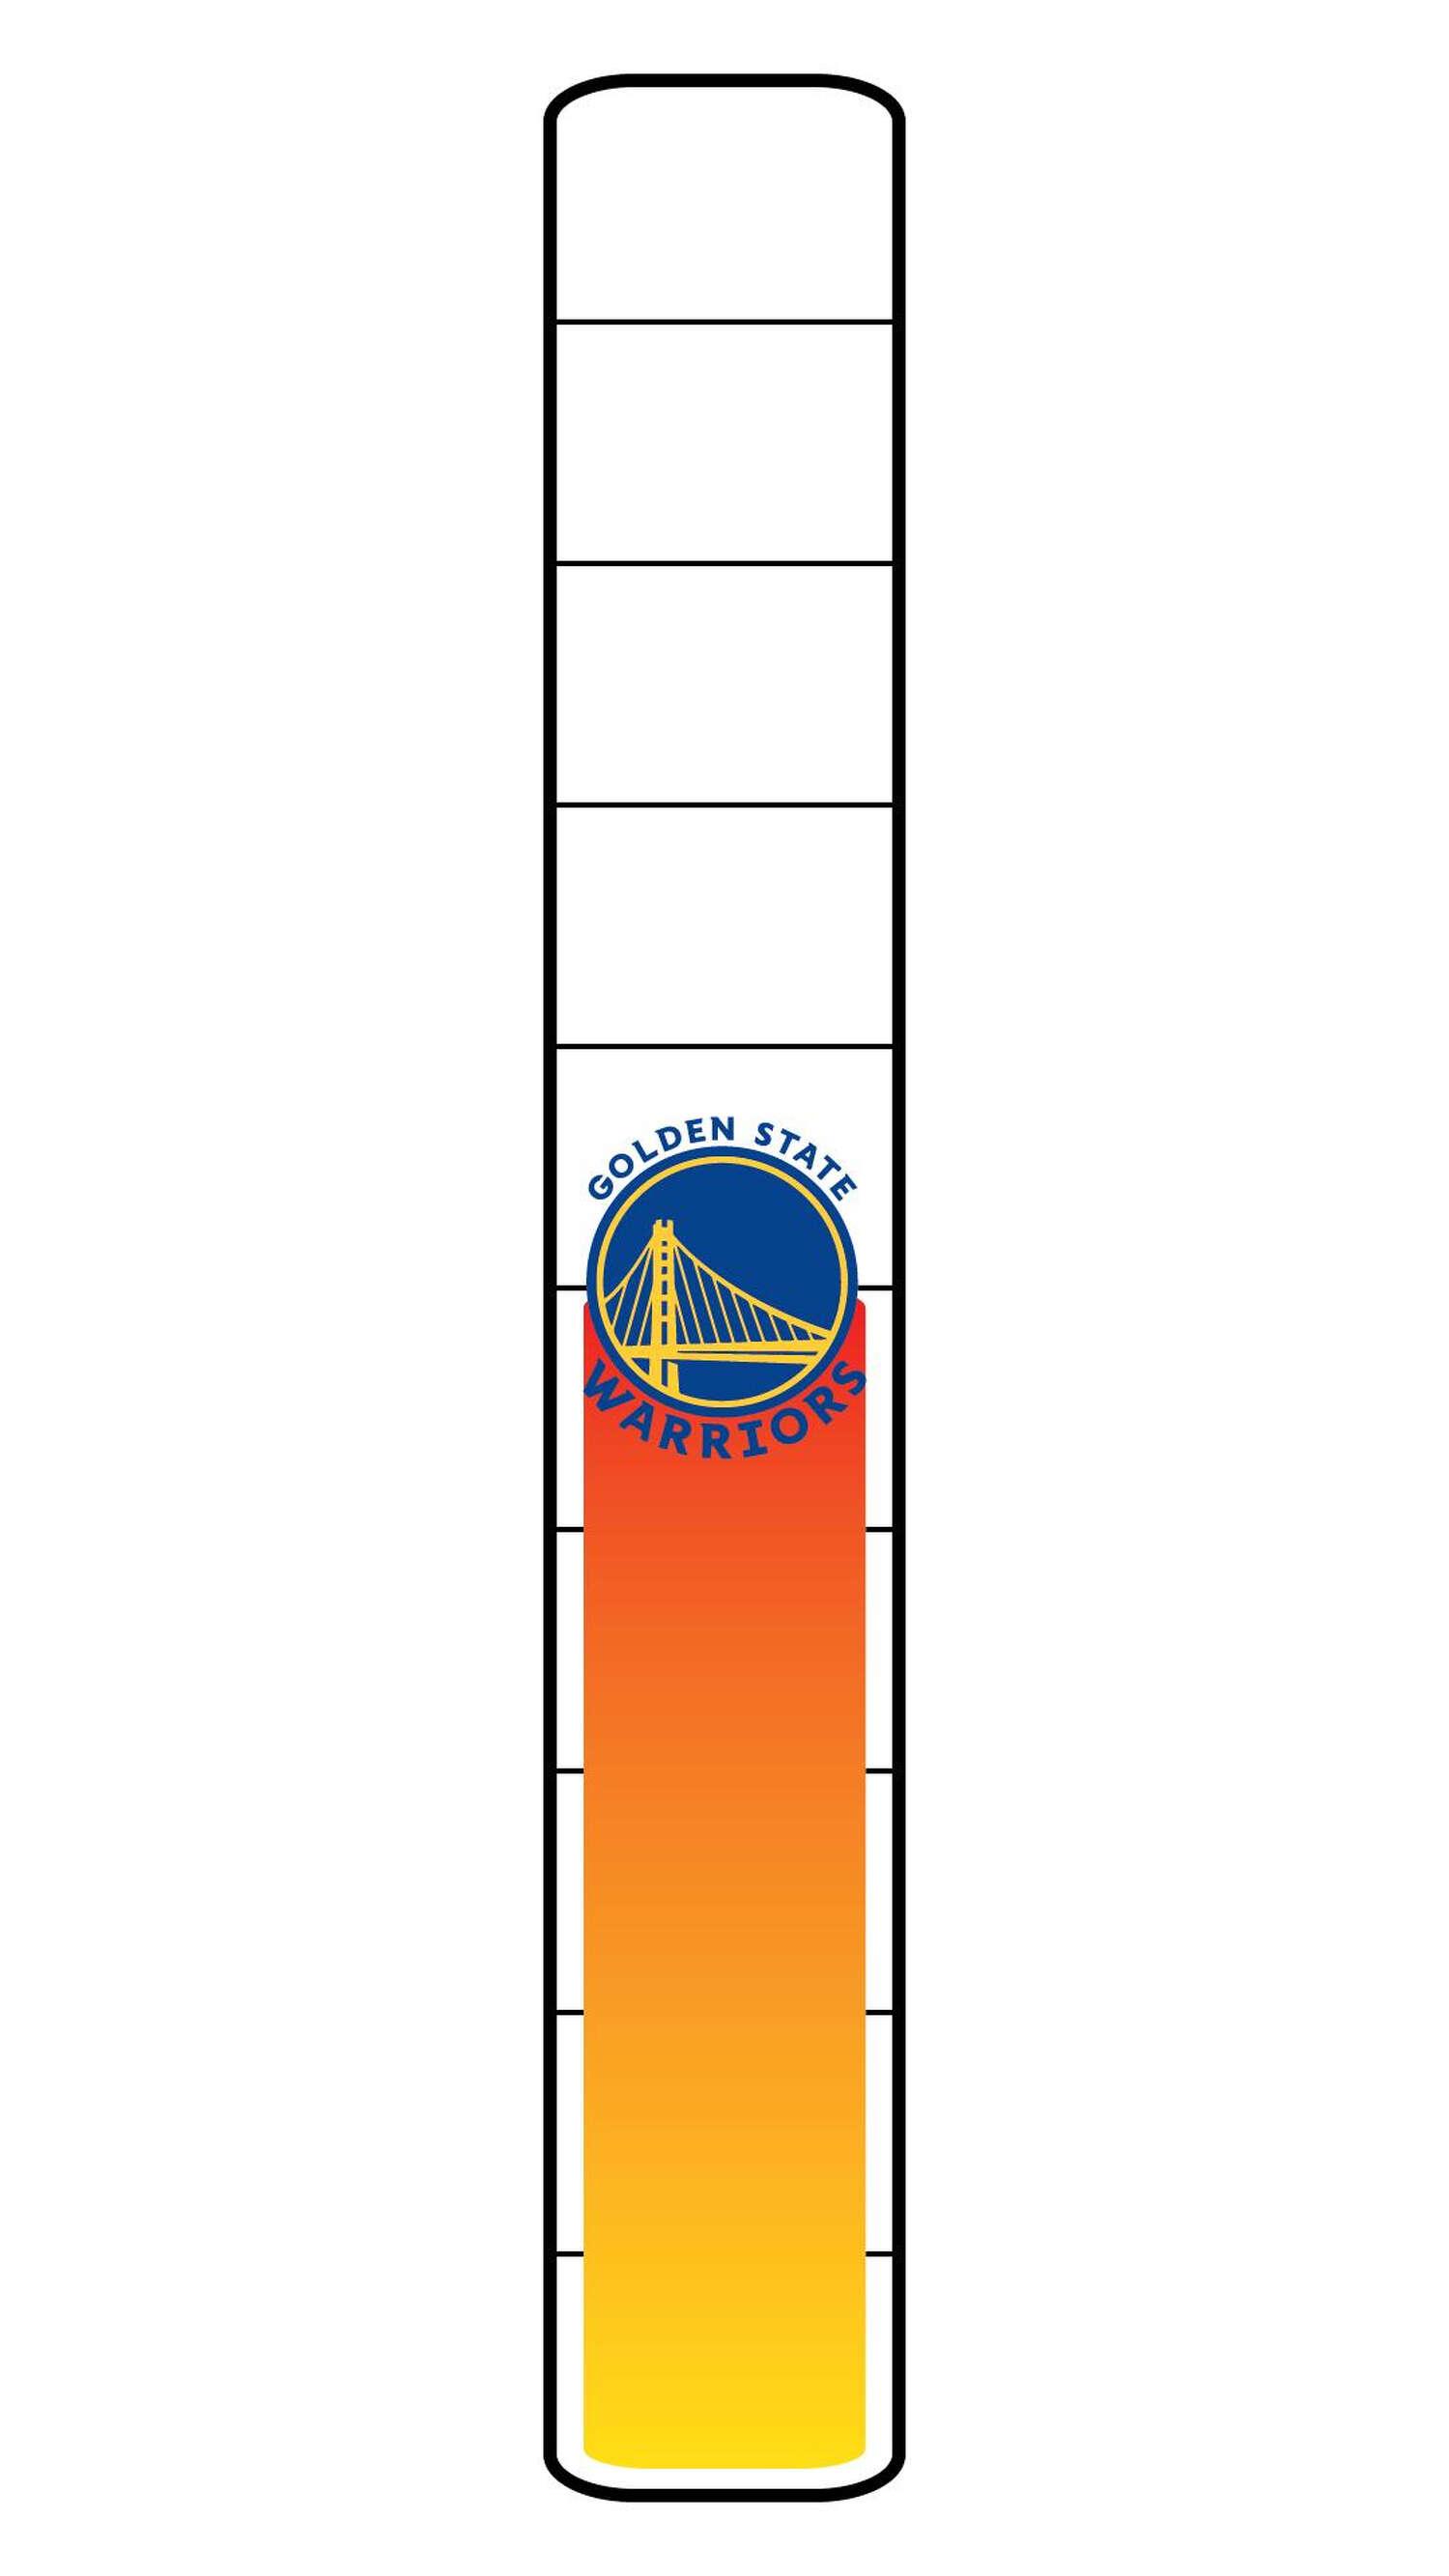 Meter: 5/10. Warriors logo icon.